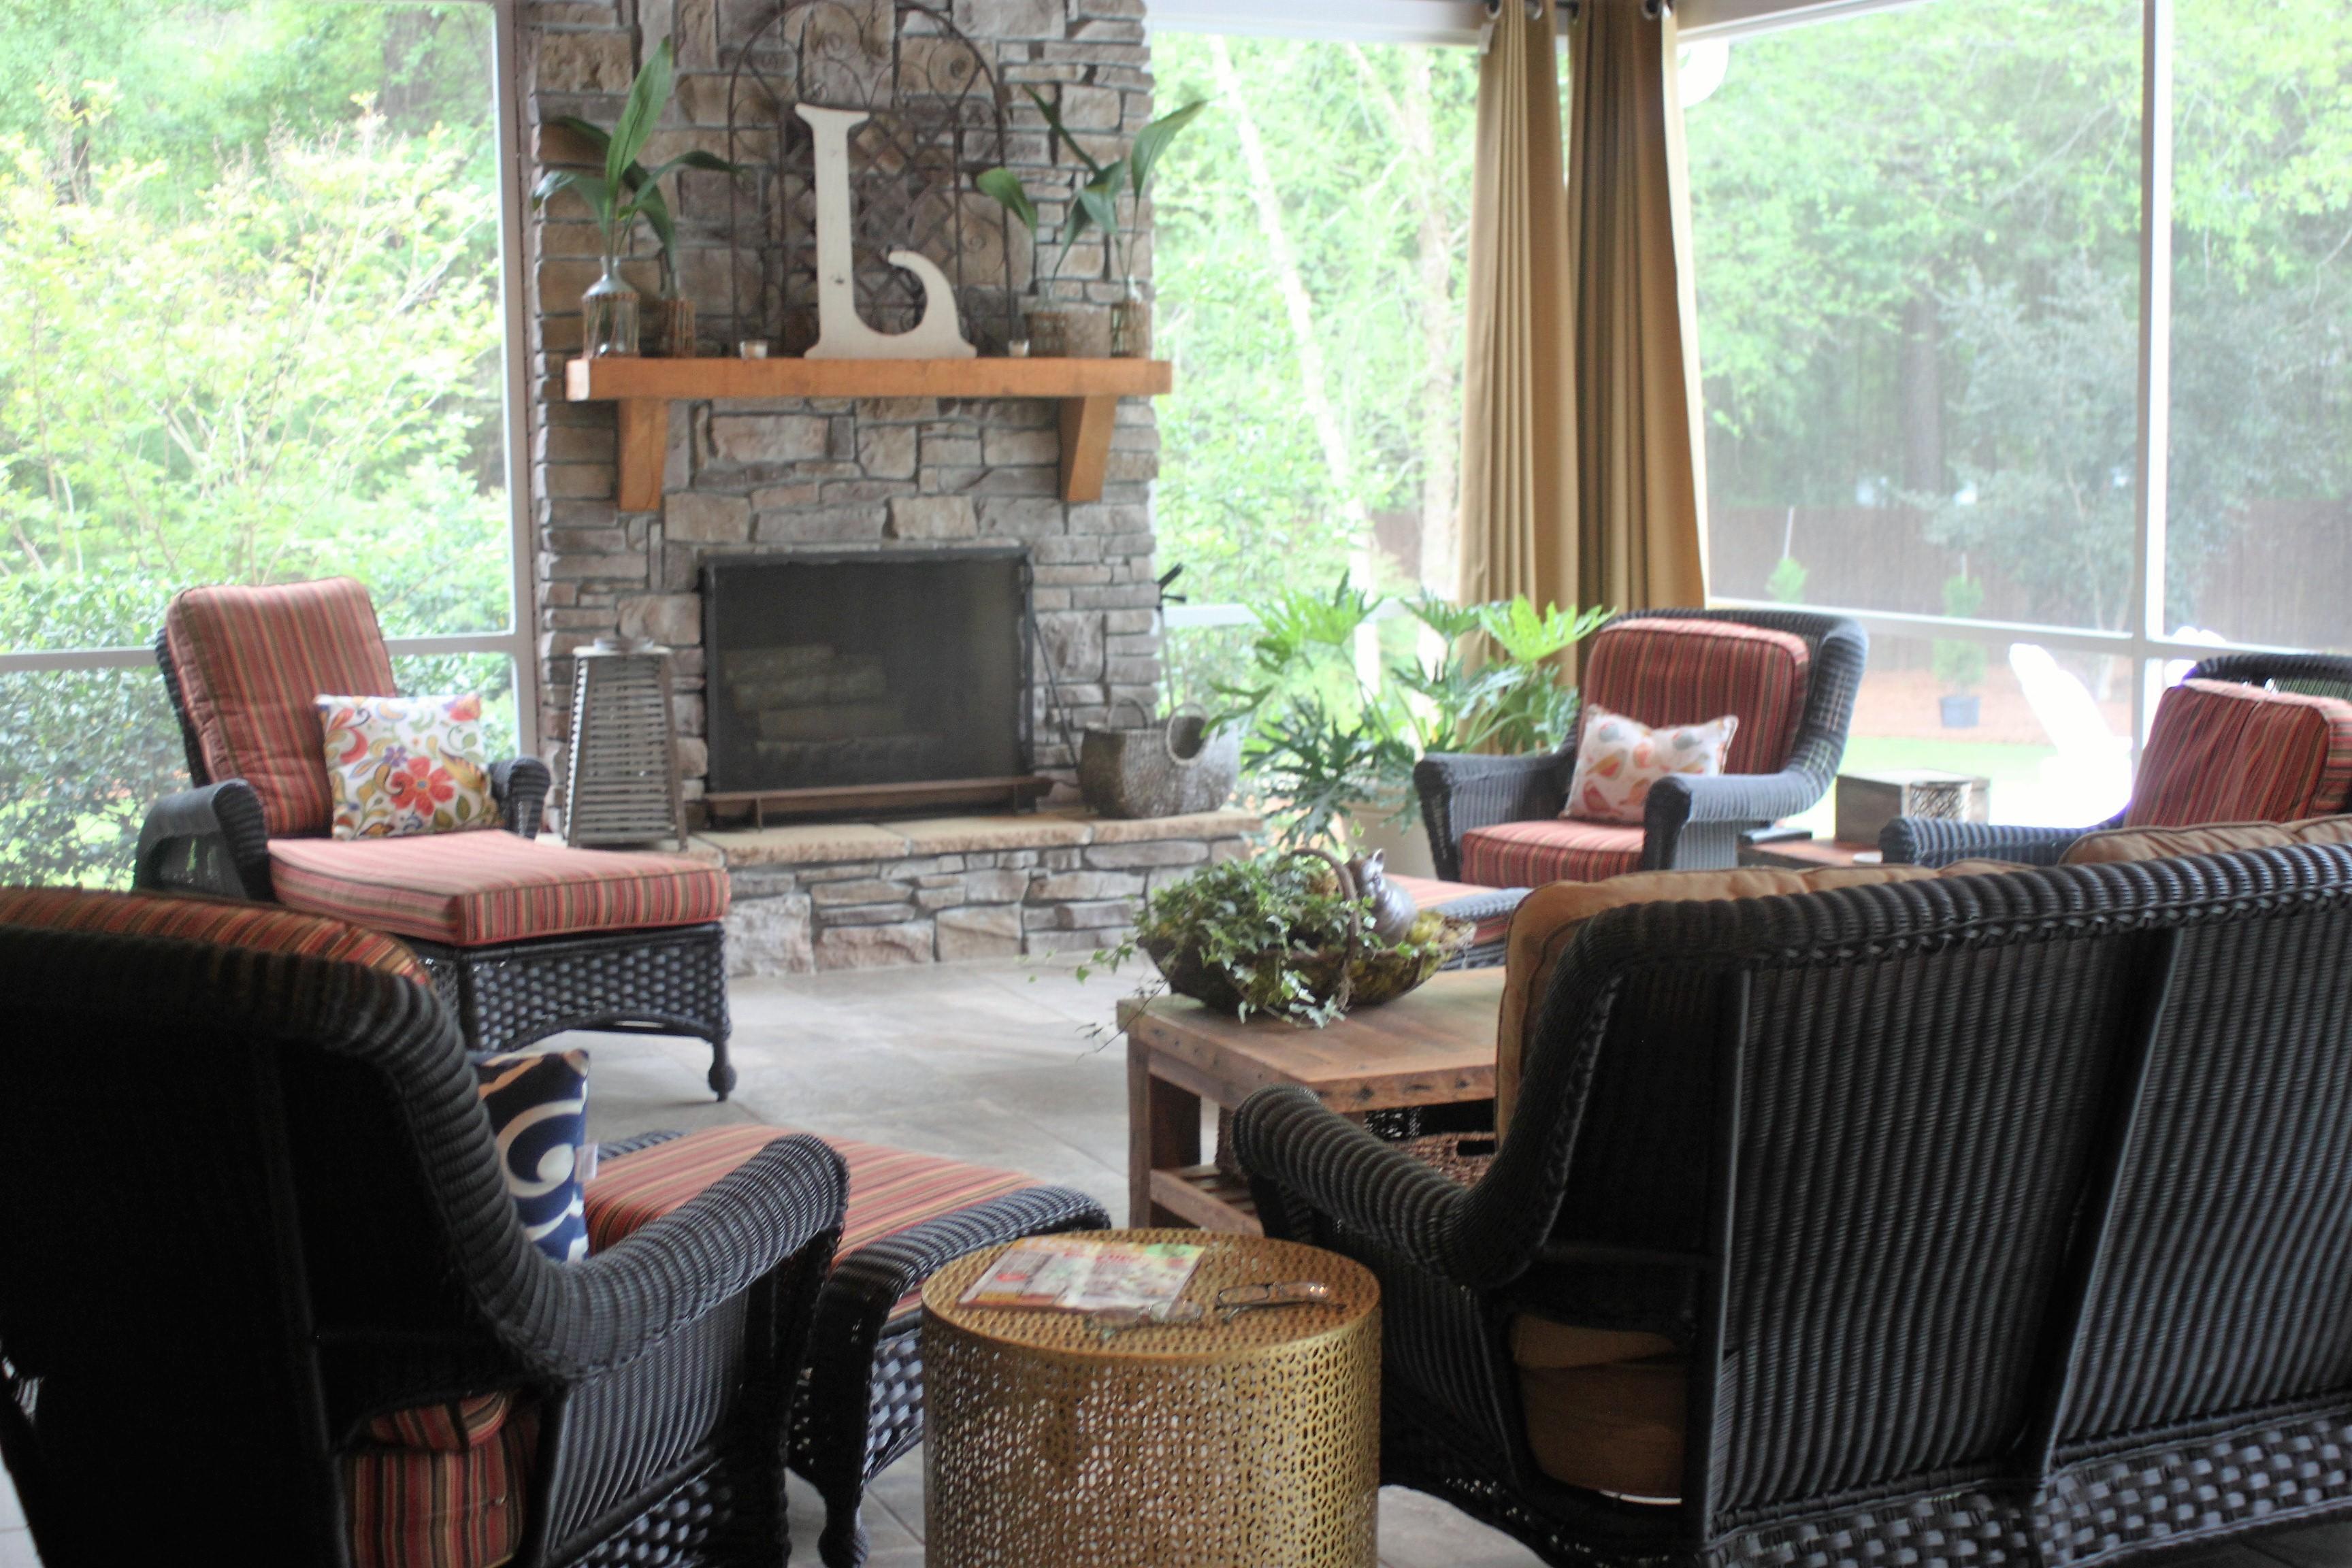 Village Furniture Dothan Alabama Beautifulgardener Using Gods Inspired  Beauty To Enhance Your